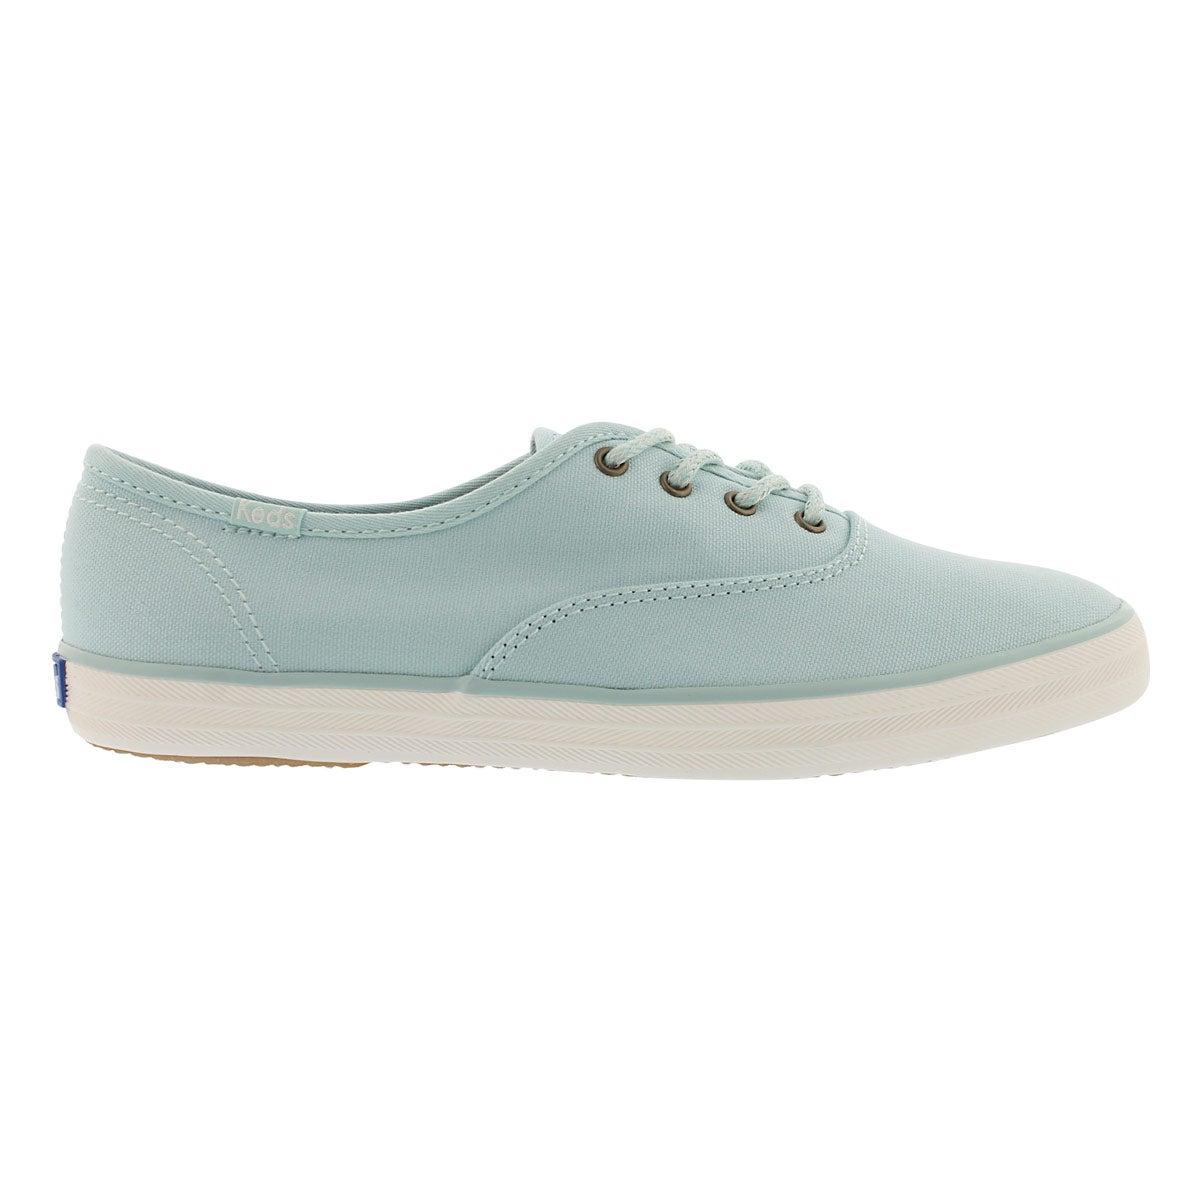 Sneaker Soled Oxford Shoes Women